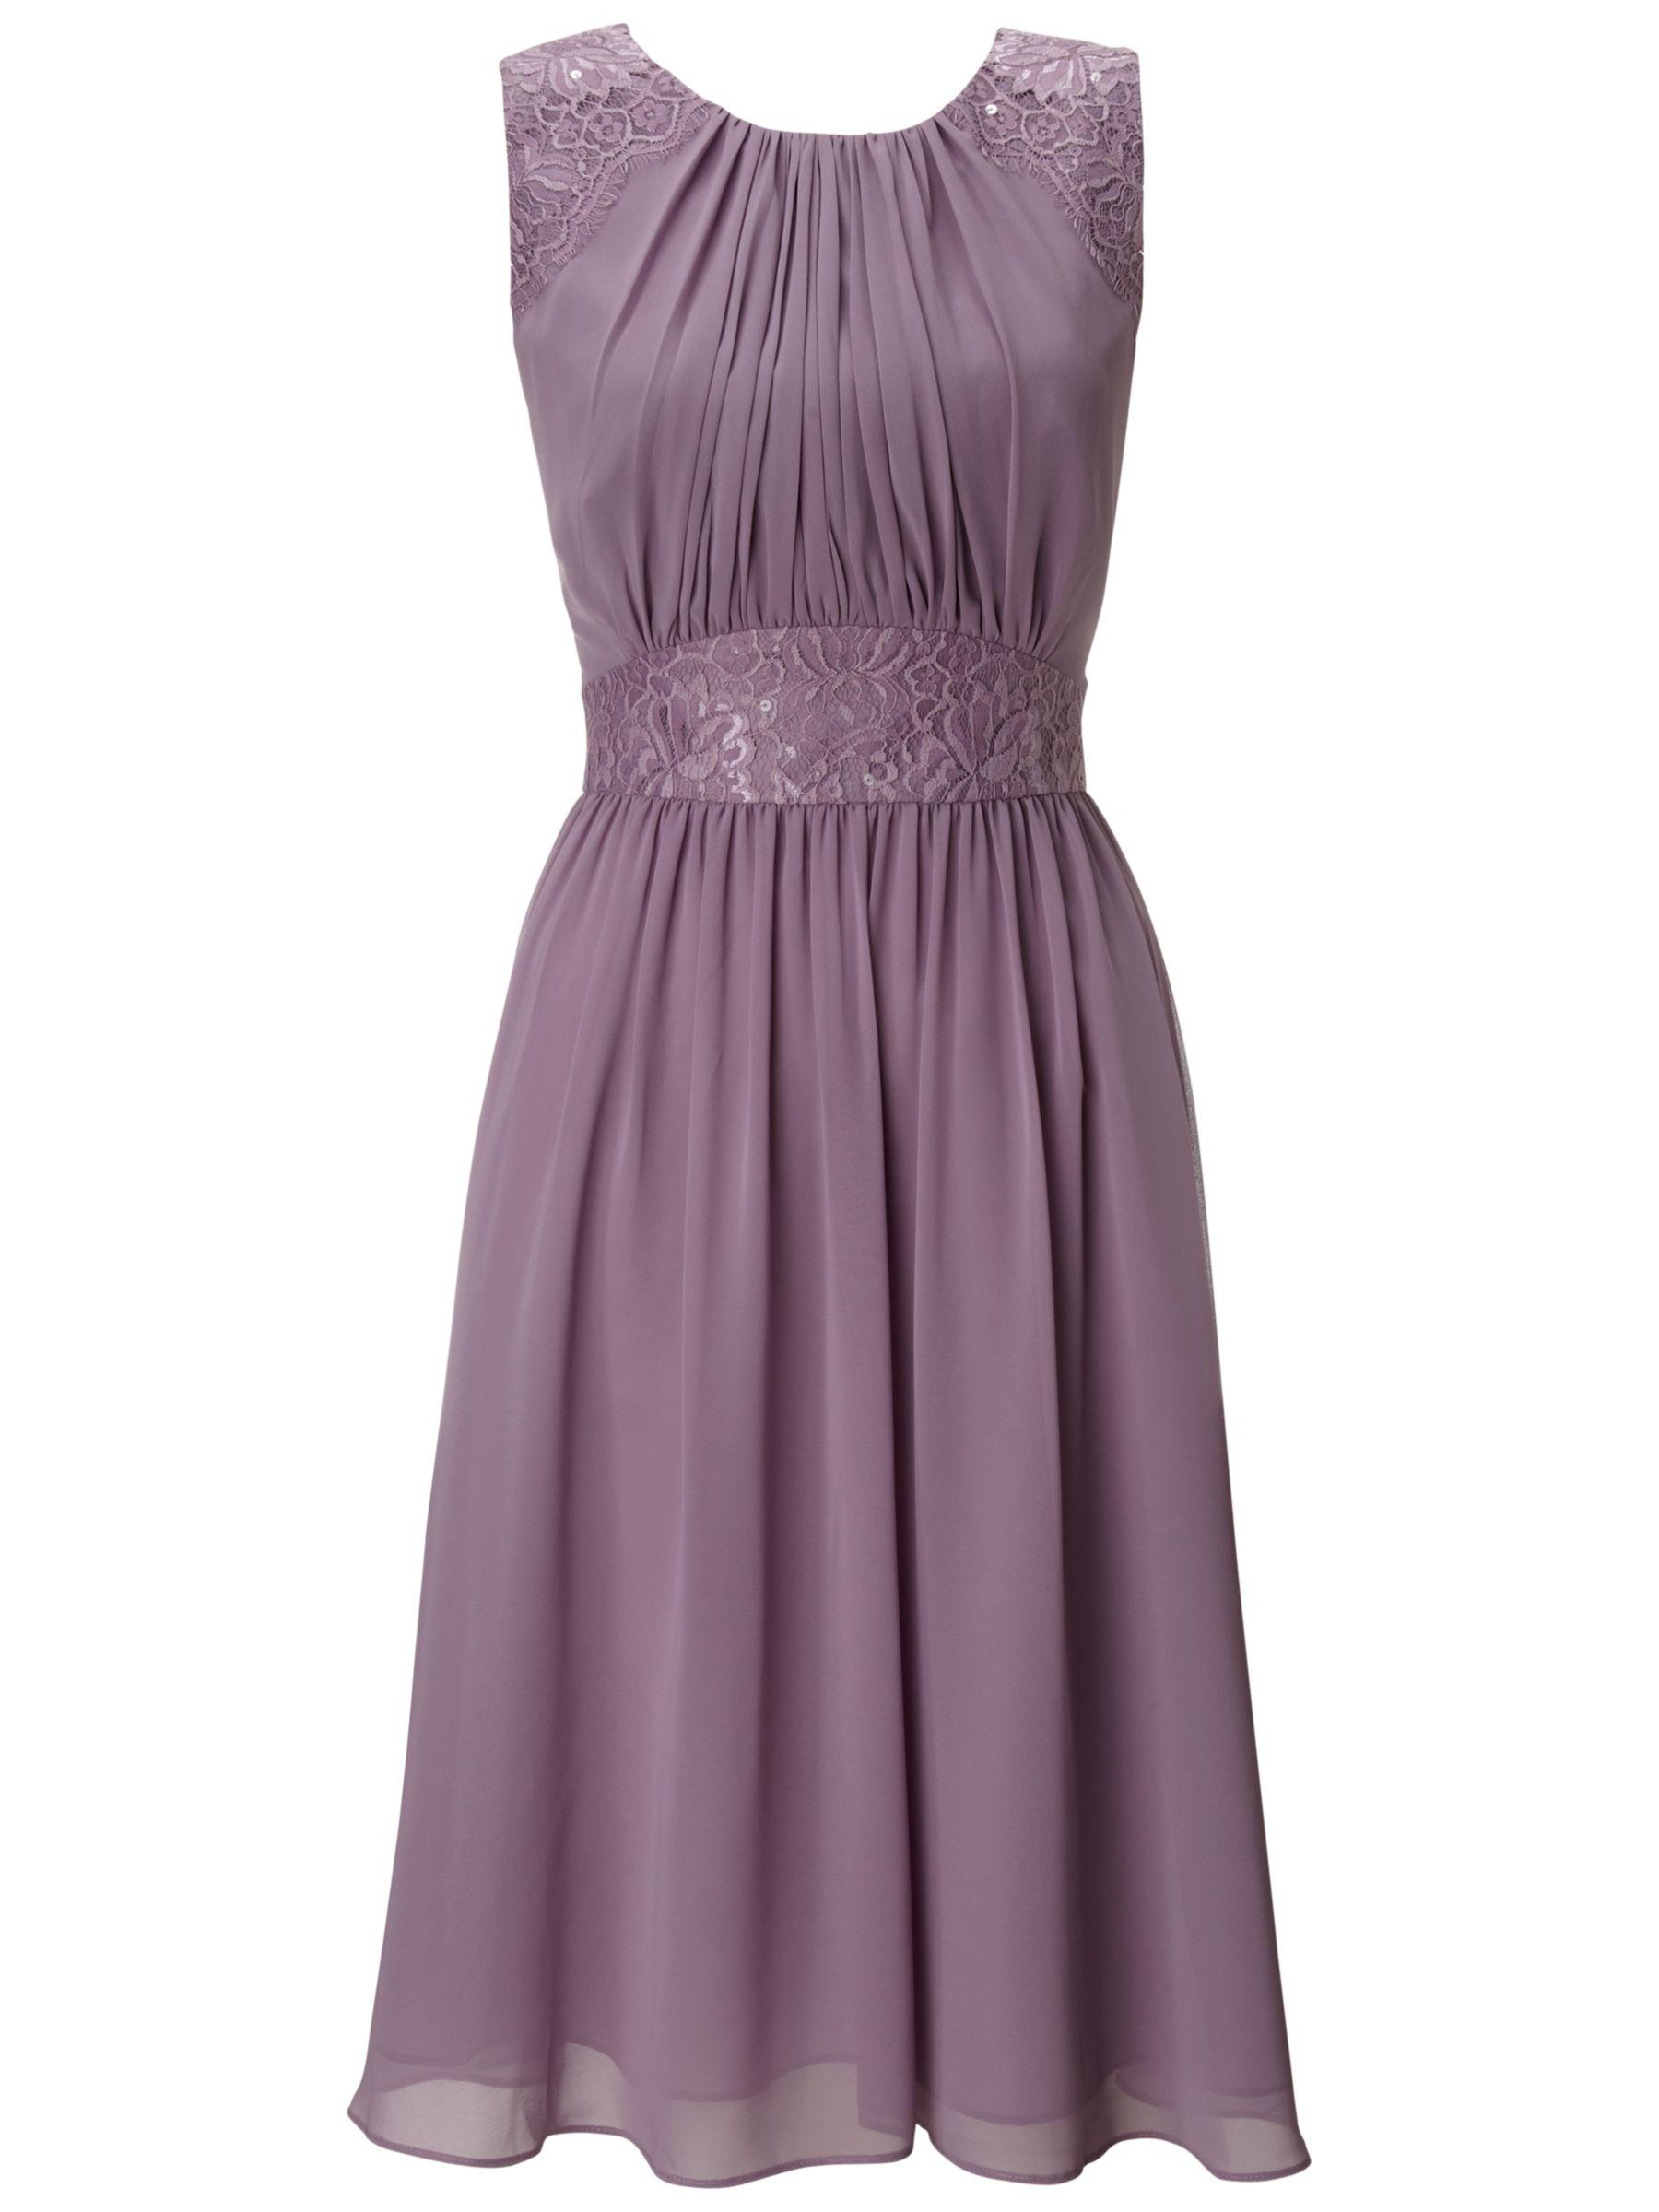 Ariella Alia Chiffon Short Dress, Lavender